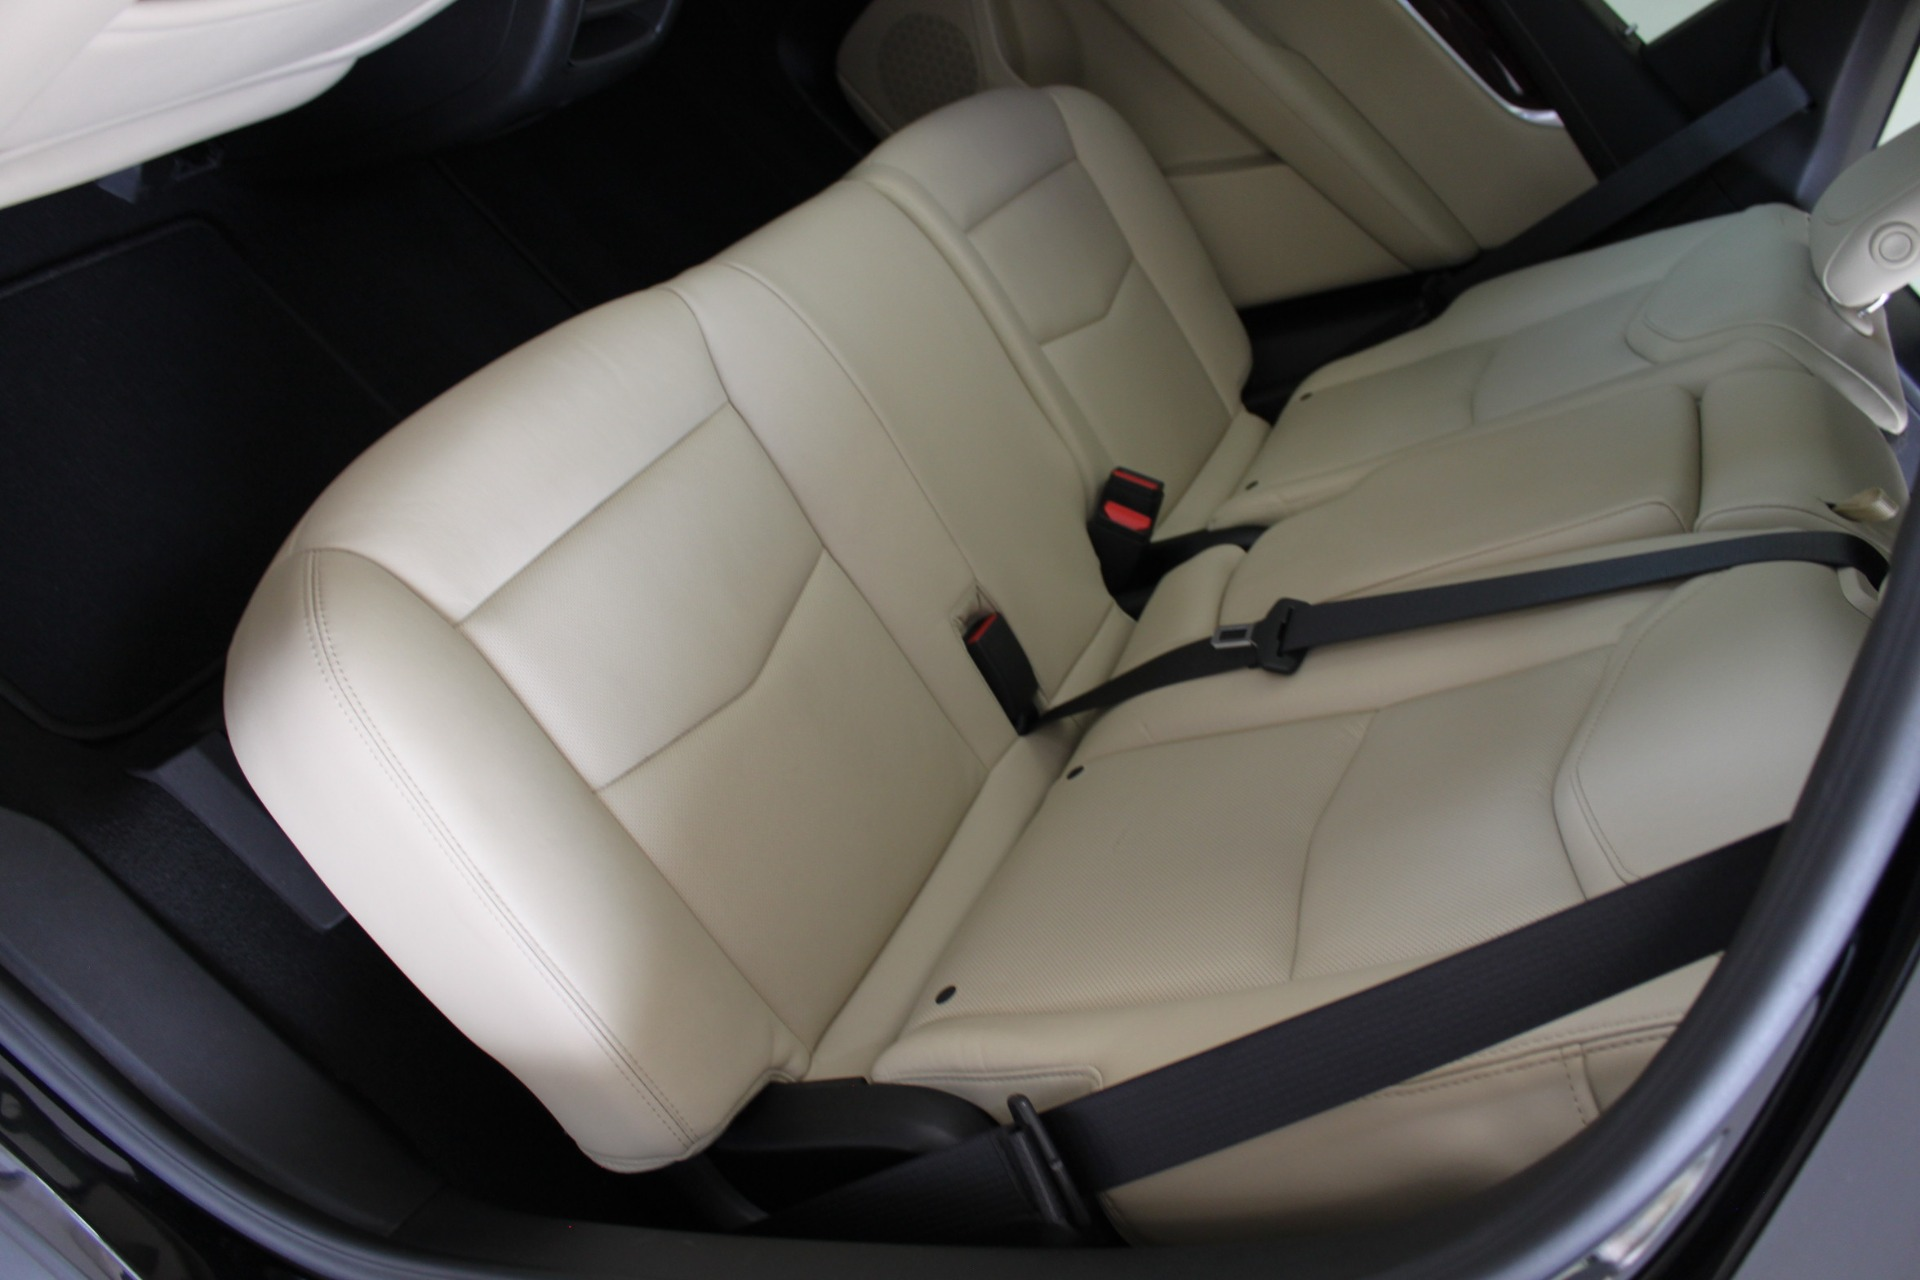 Used-2017-Cadillac-XT5-Luxury-All-Wheel-Drive-Luxury-AWD-LS430